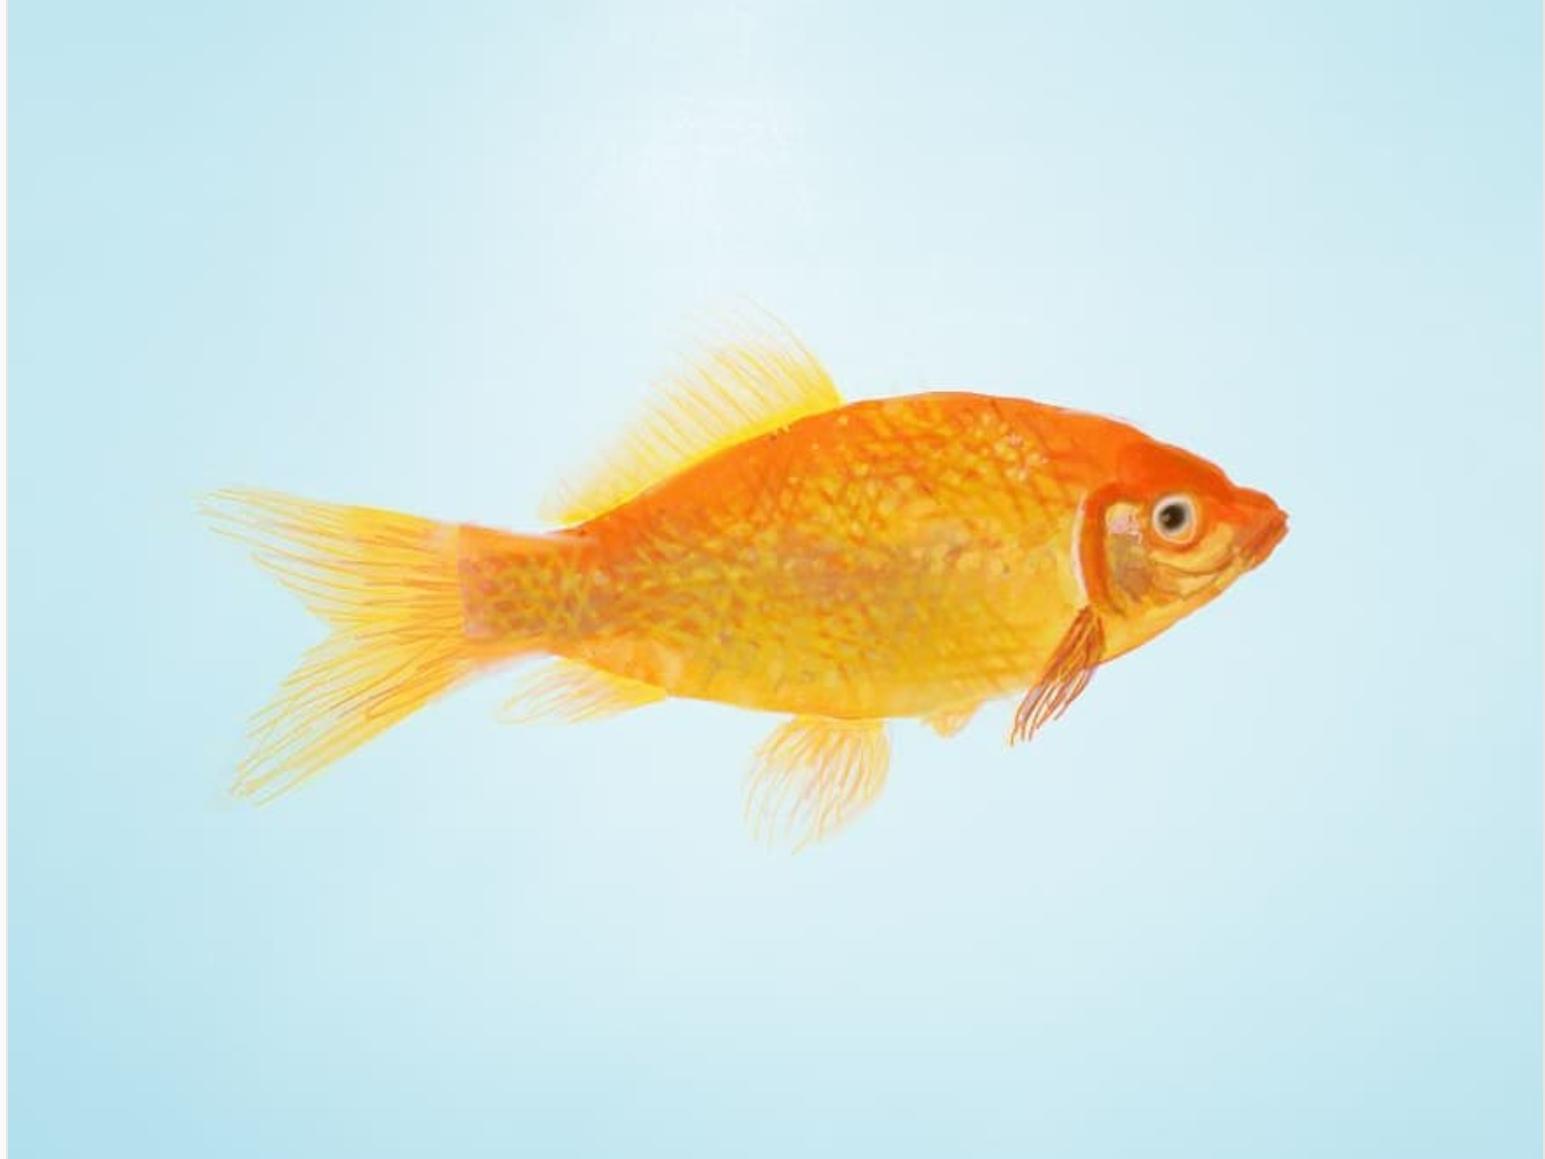 goldfish illustration goldfish autodesk sketchbook digital drawing digital illustration